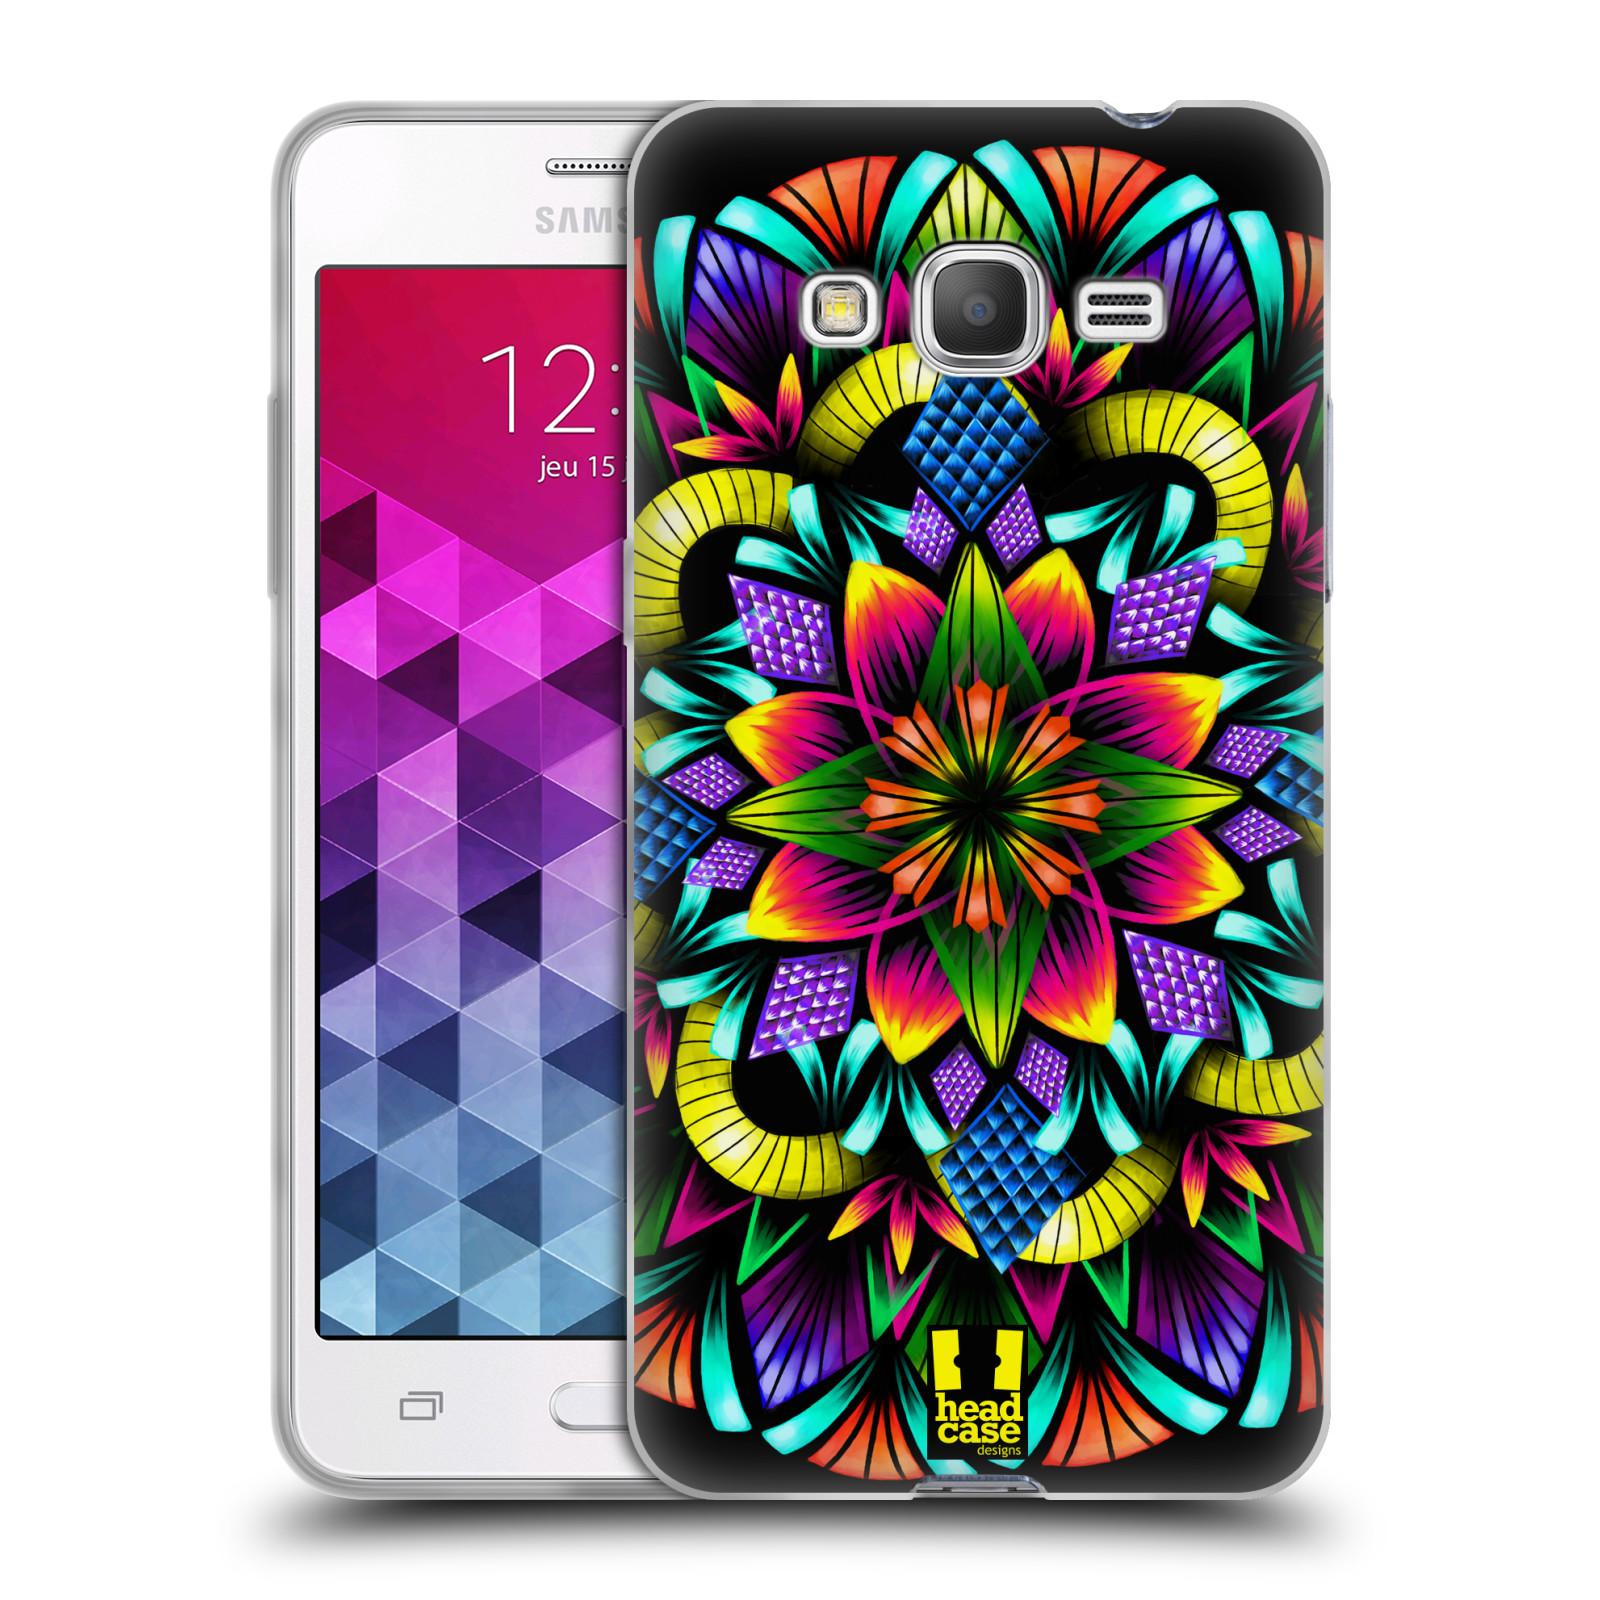 Silikonové pouzdro na mobil Samsung Galaxy Grand Prime HEAD CASE Květina mandala